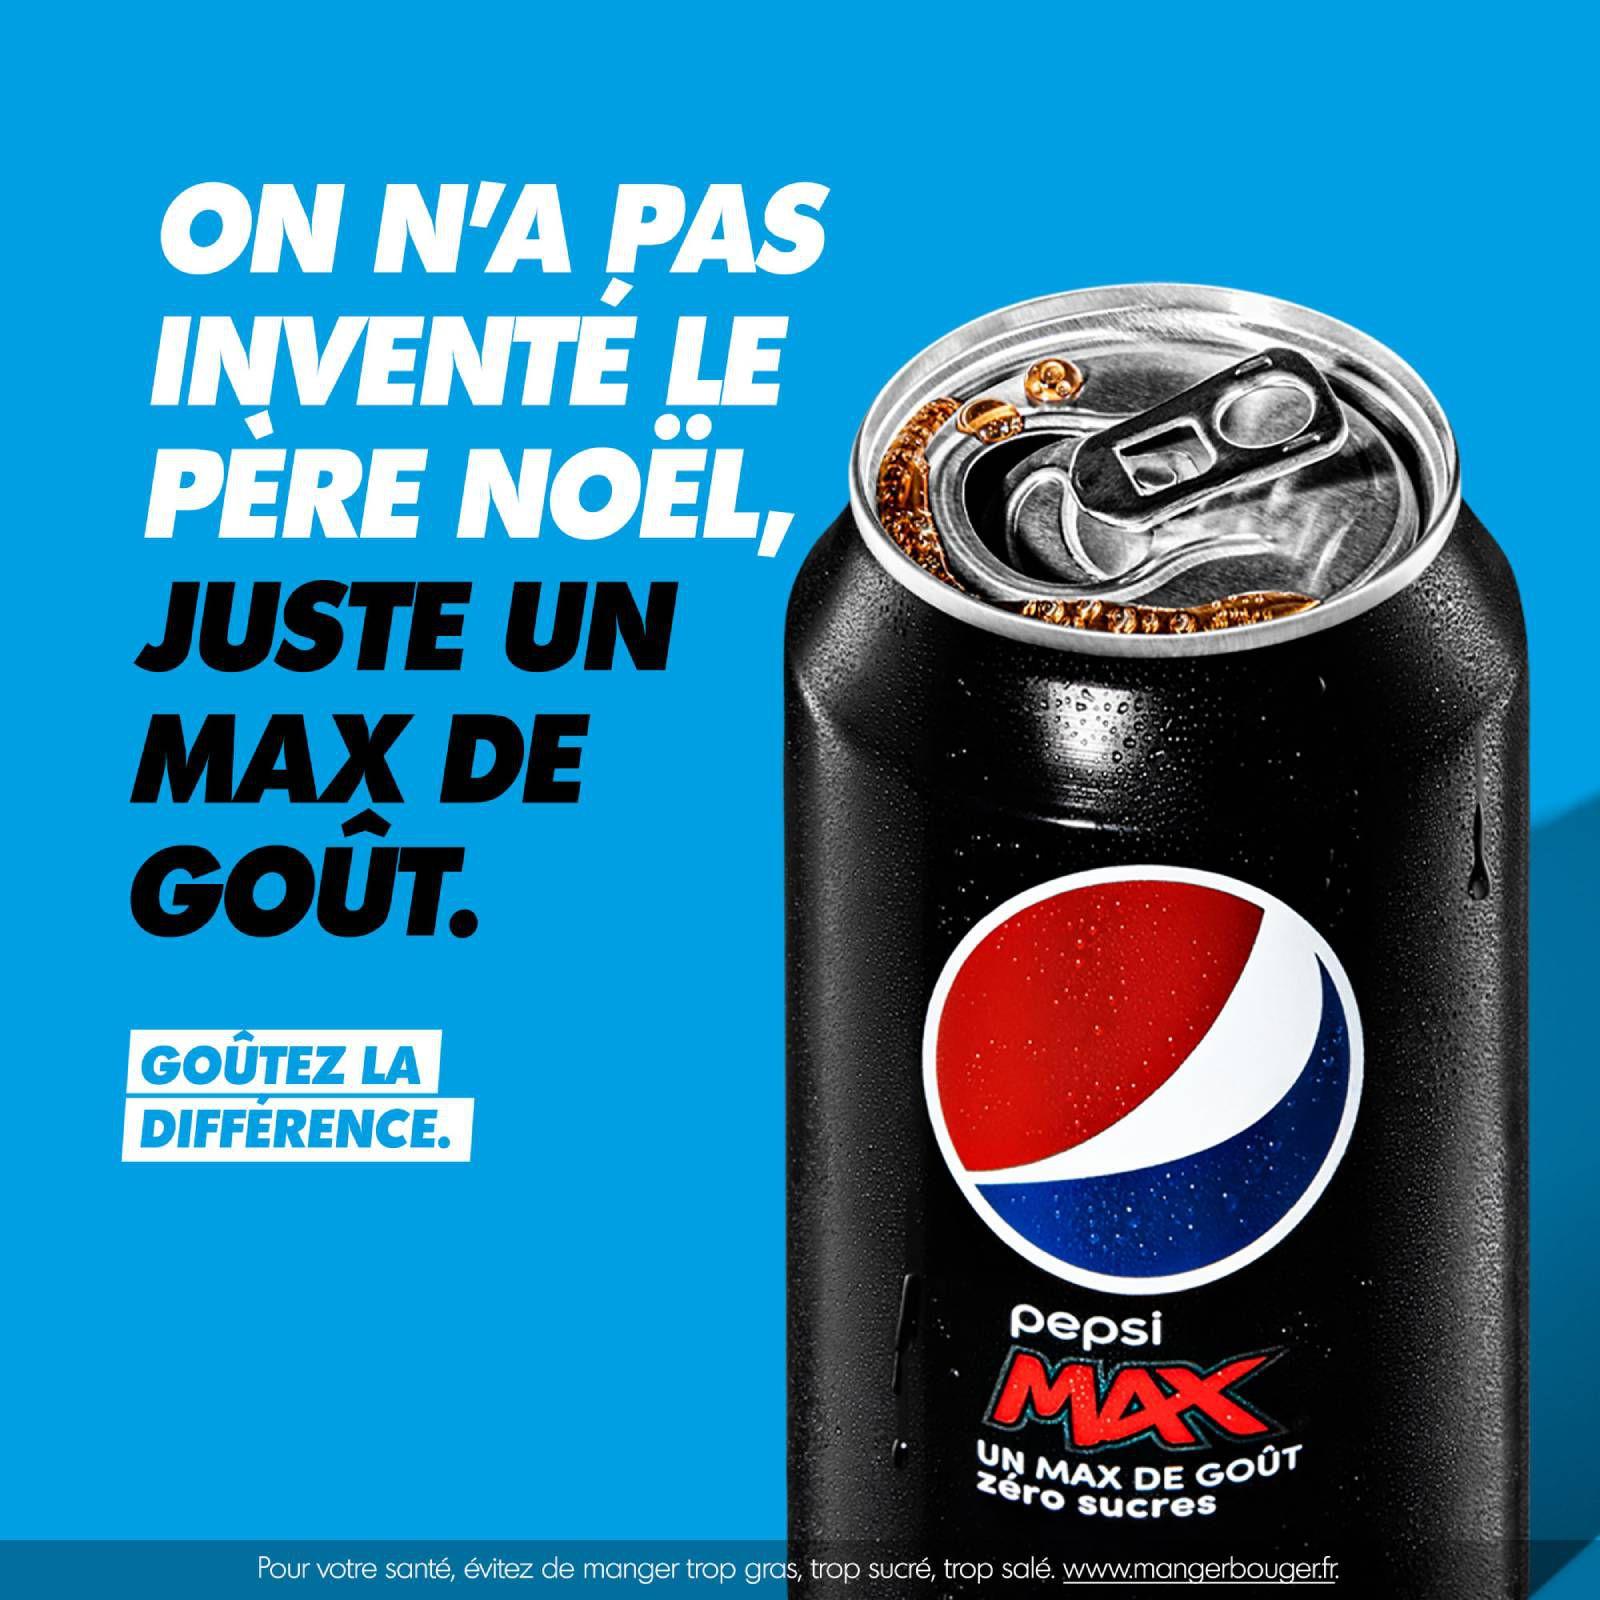 "Pepsi Max : ""Goûtez la différence"" (cola) I Agence : Buzzman, France (juin 2021)"